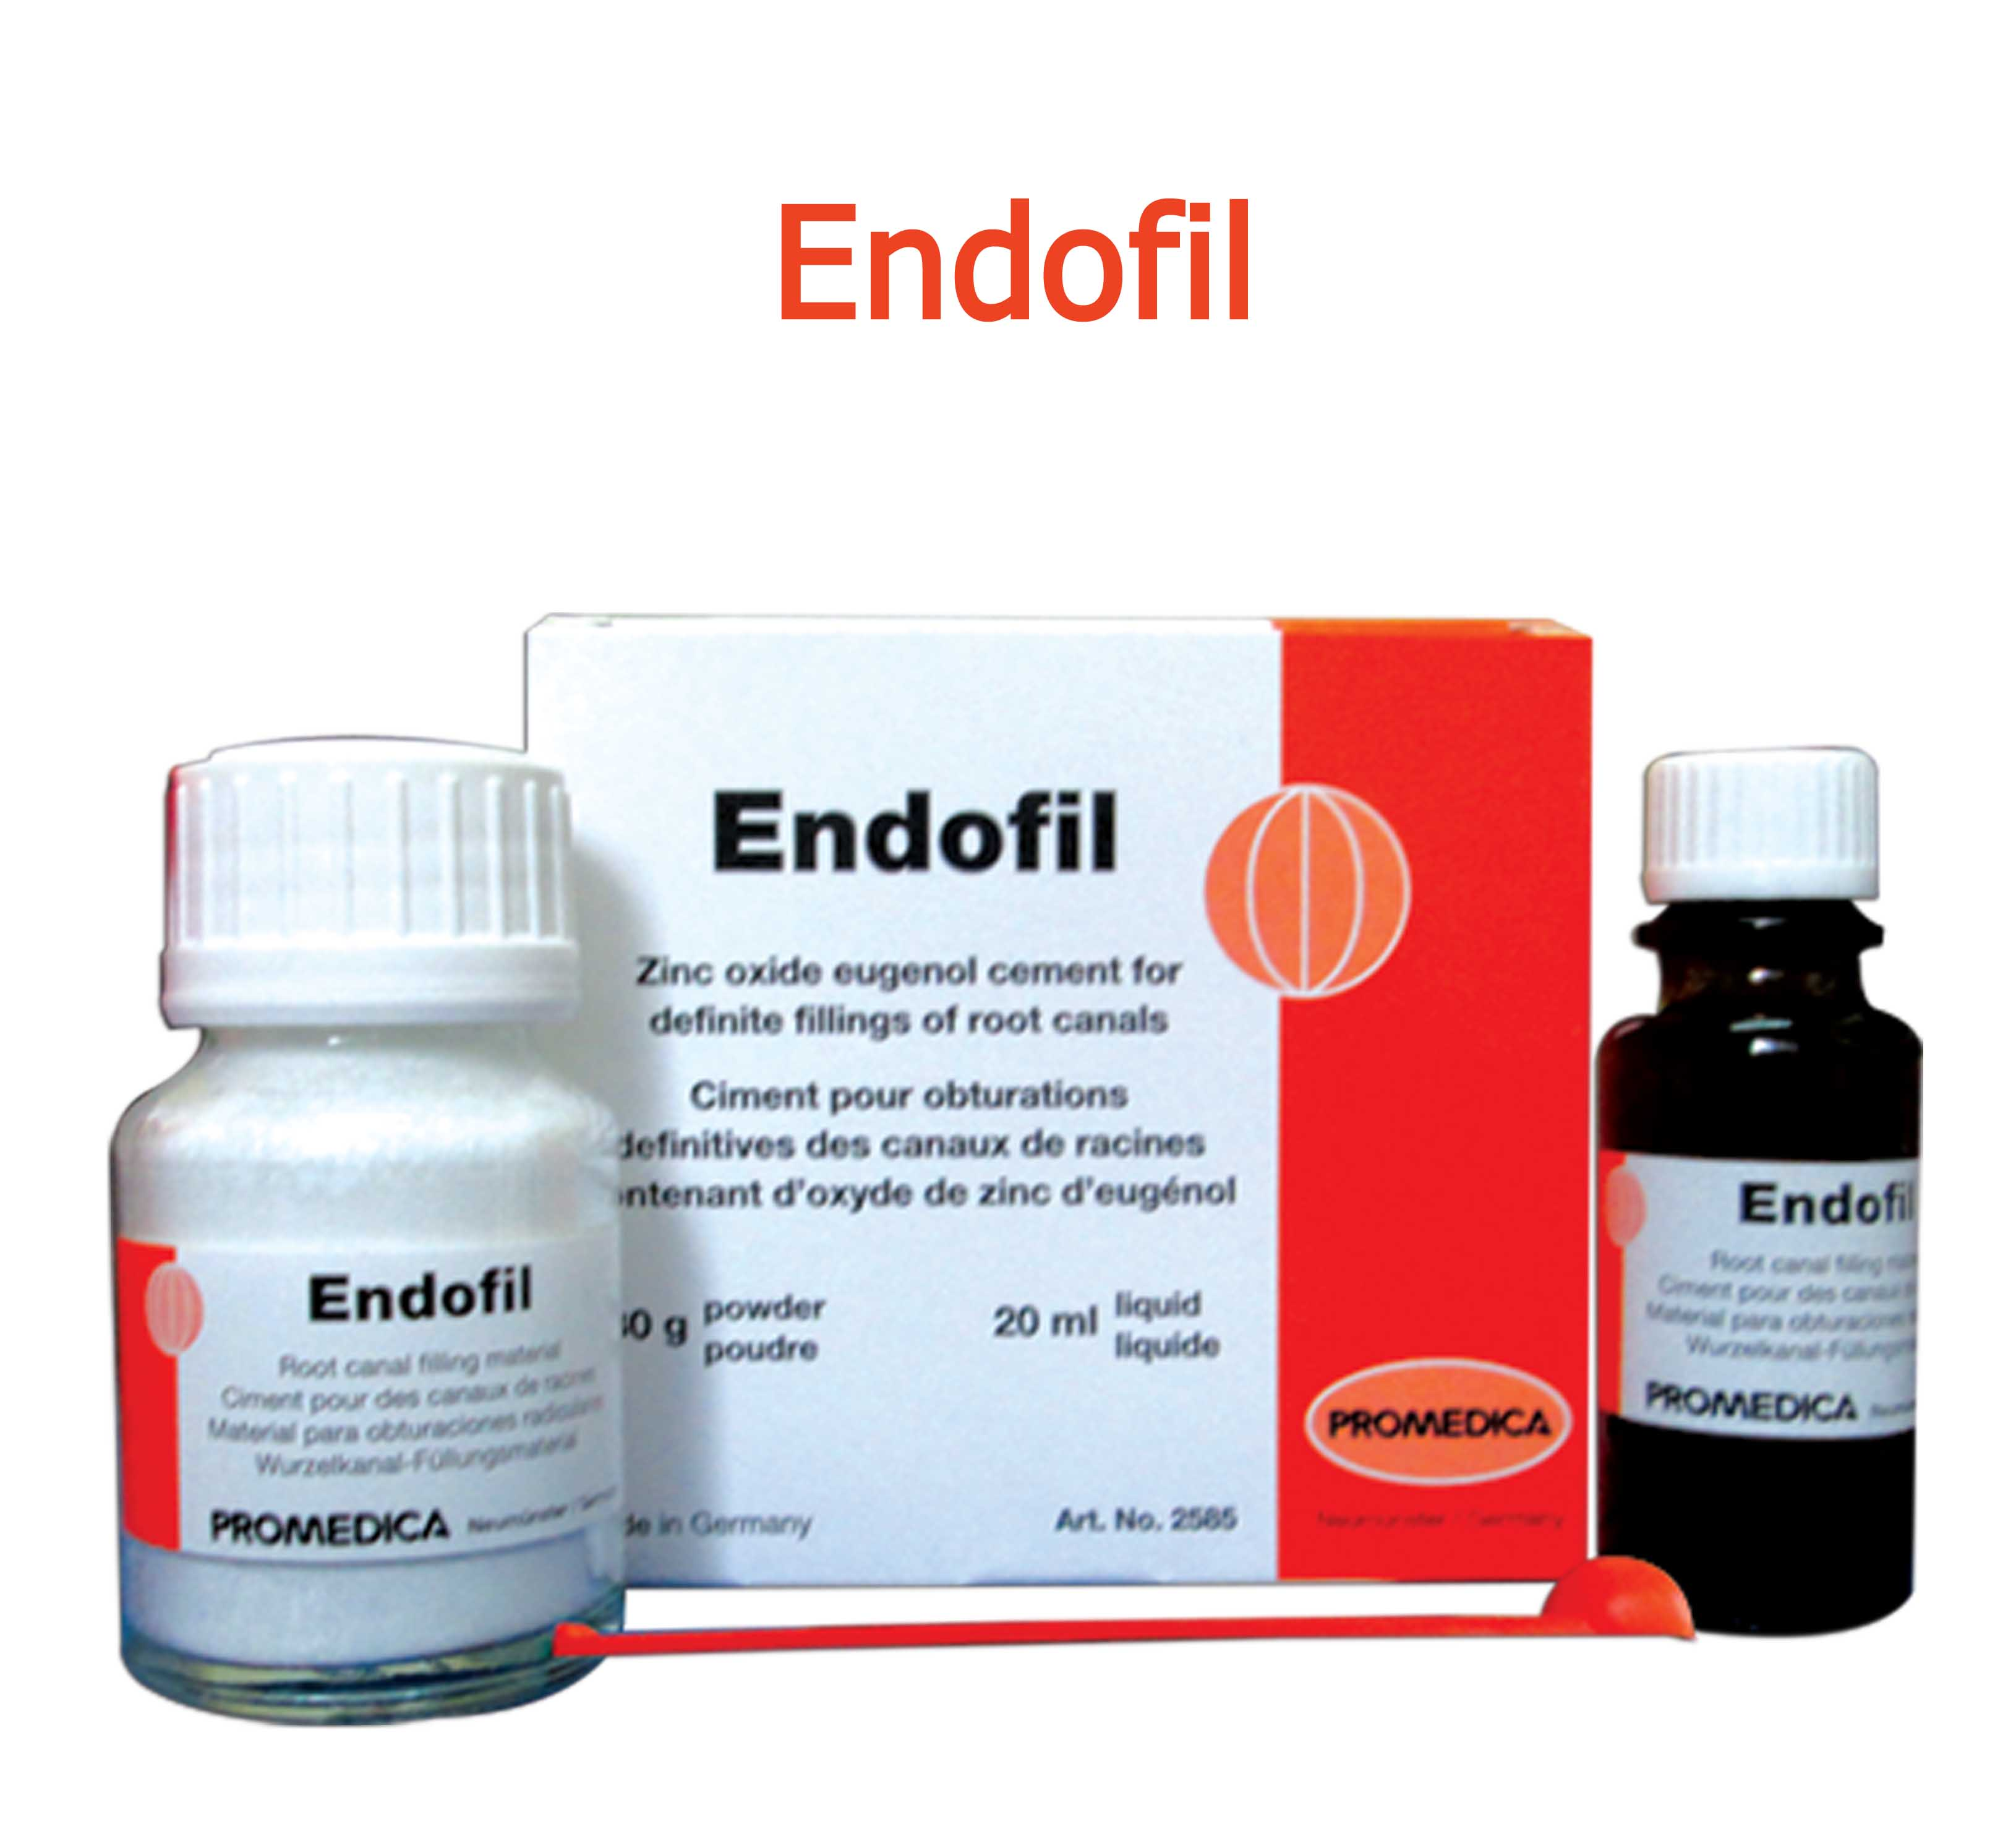 Endofil 20ml